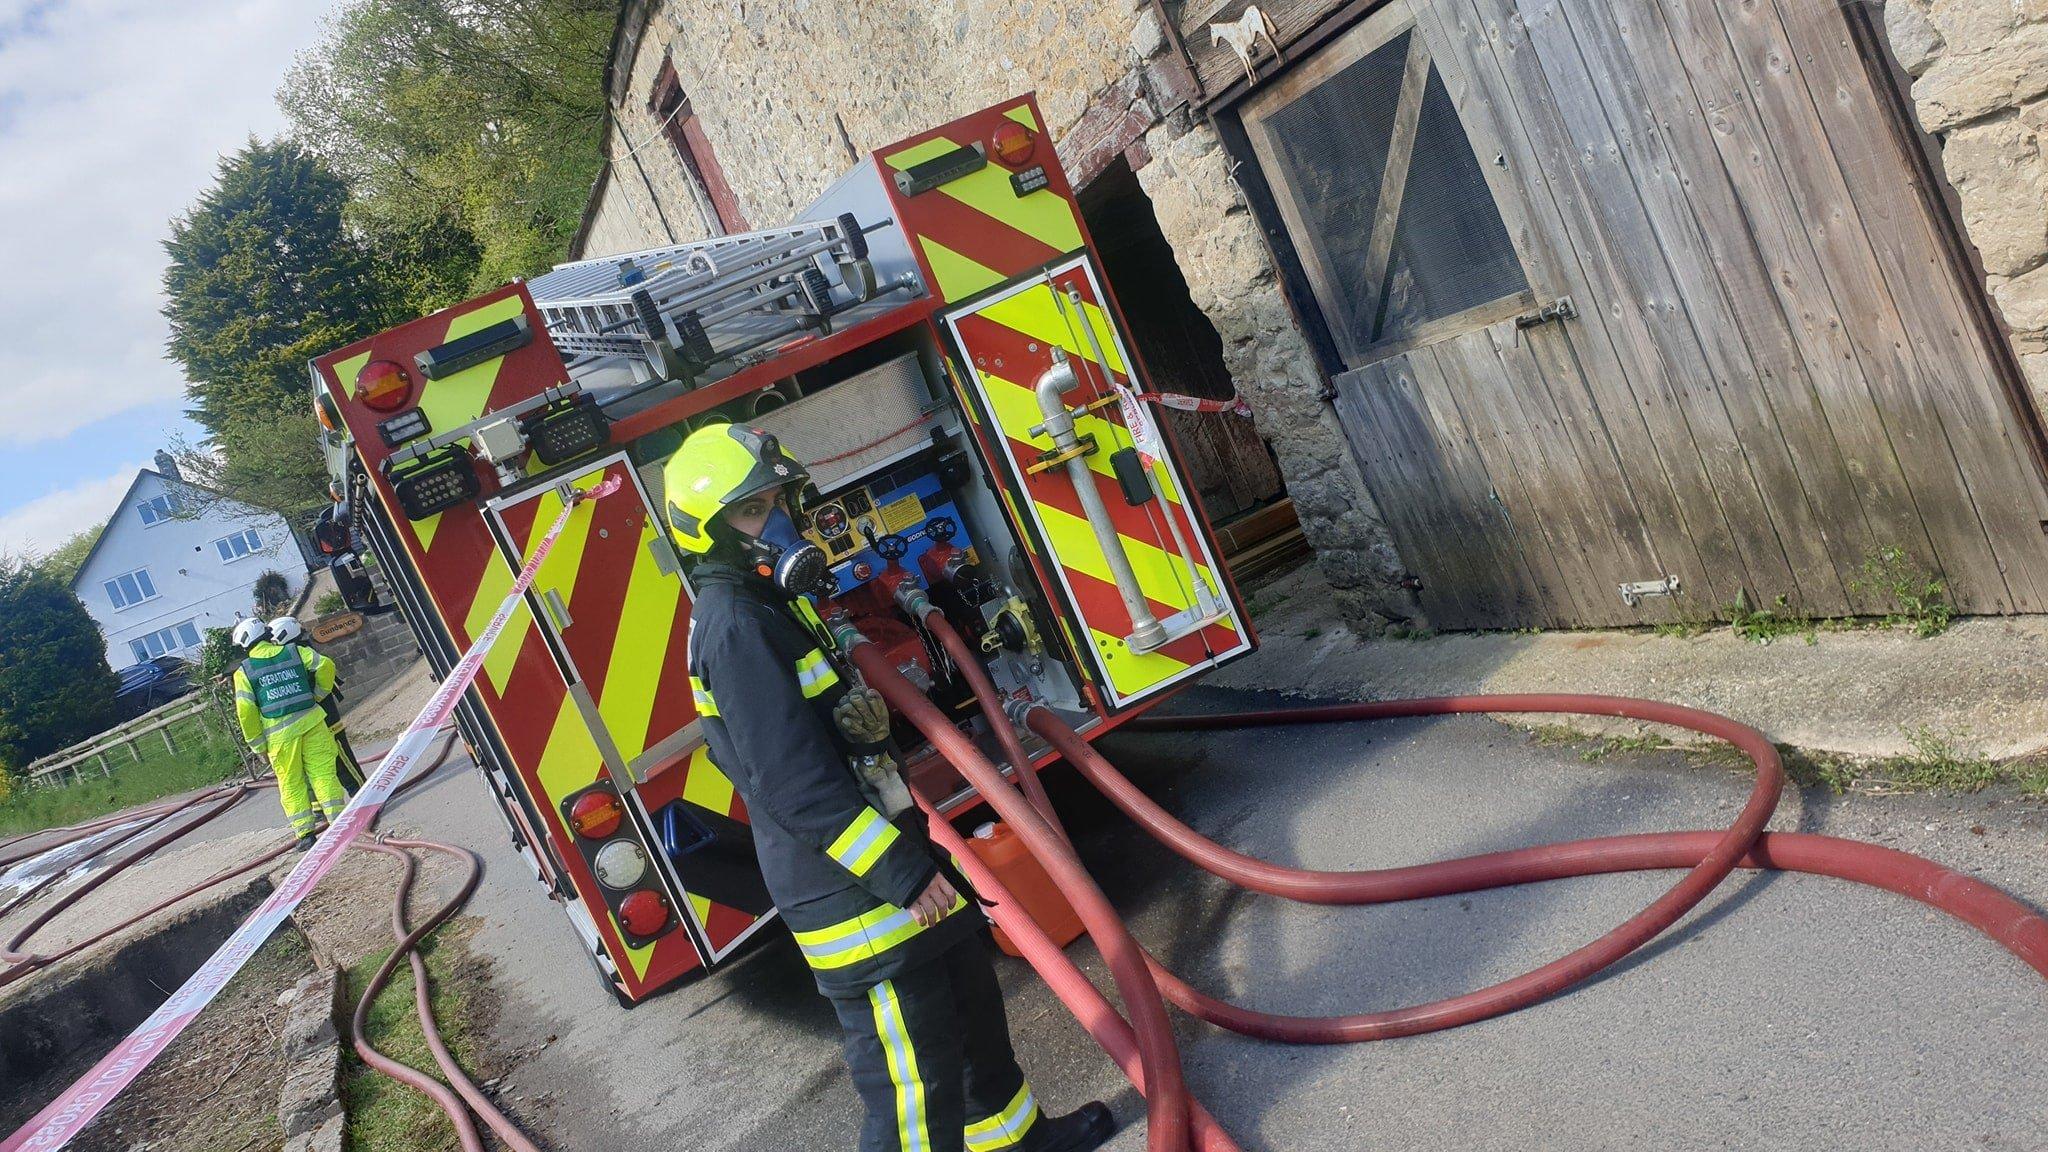 Branscombe fire